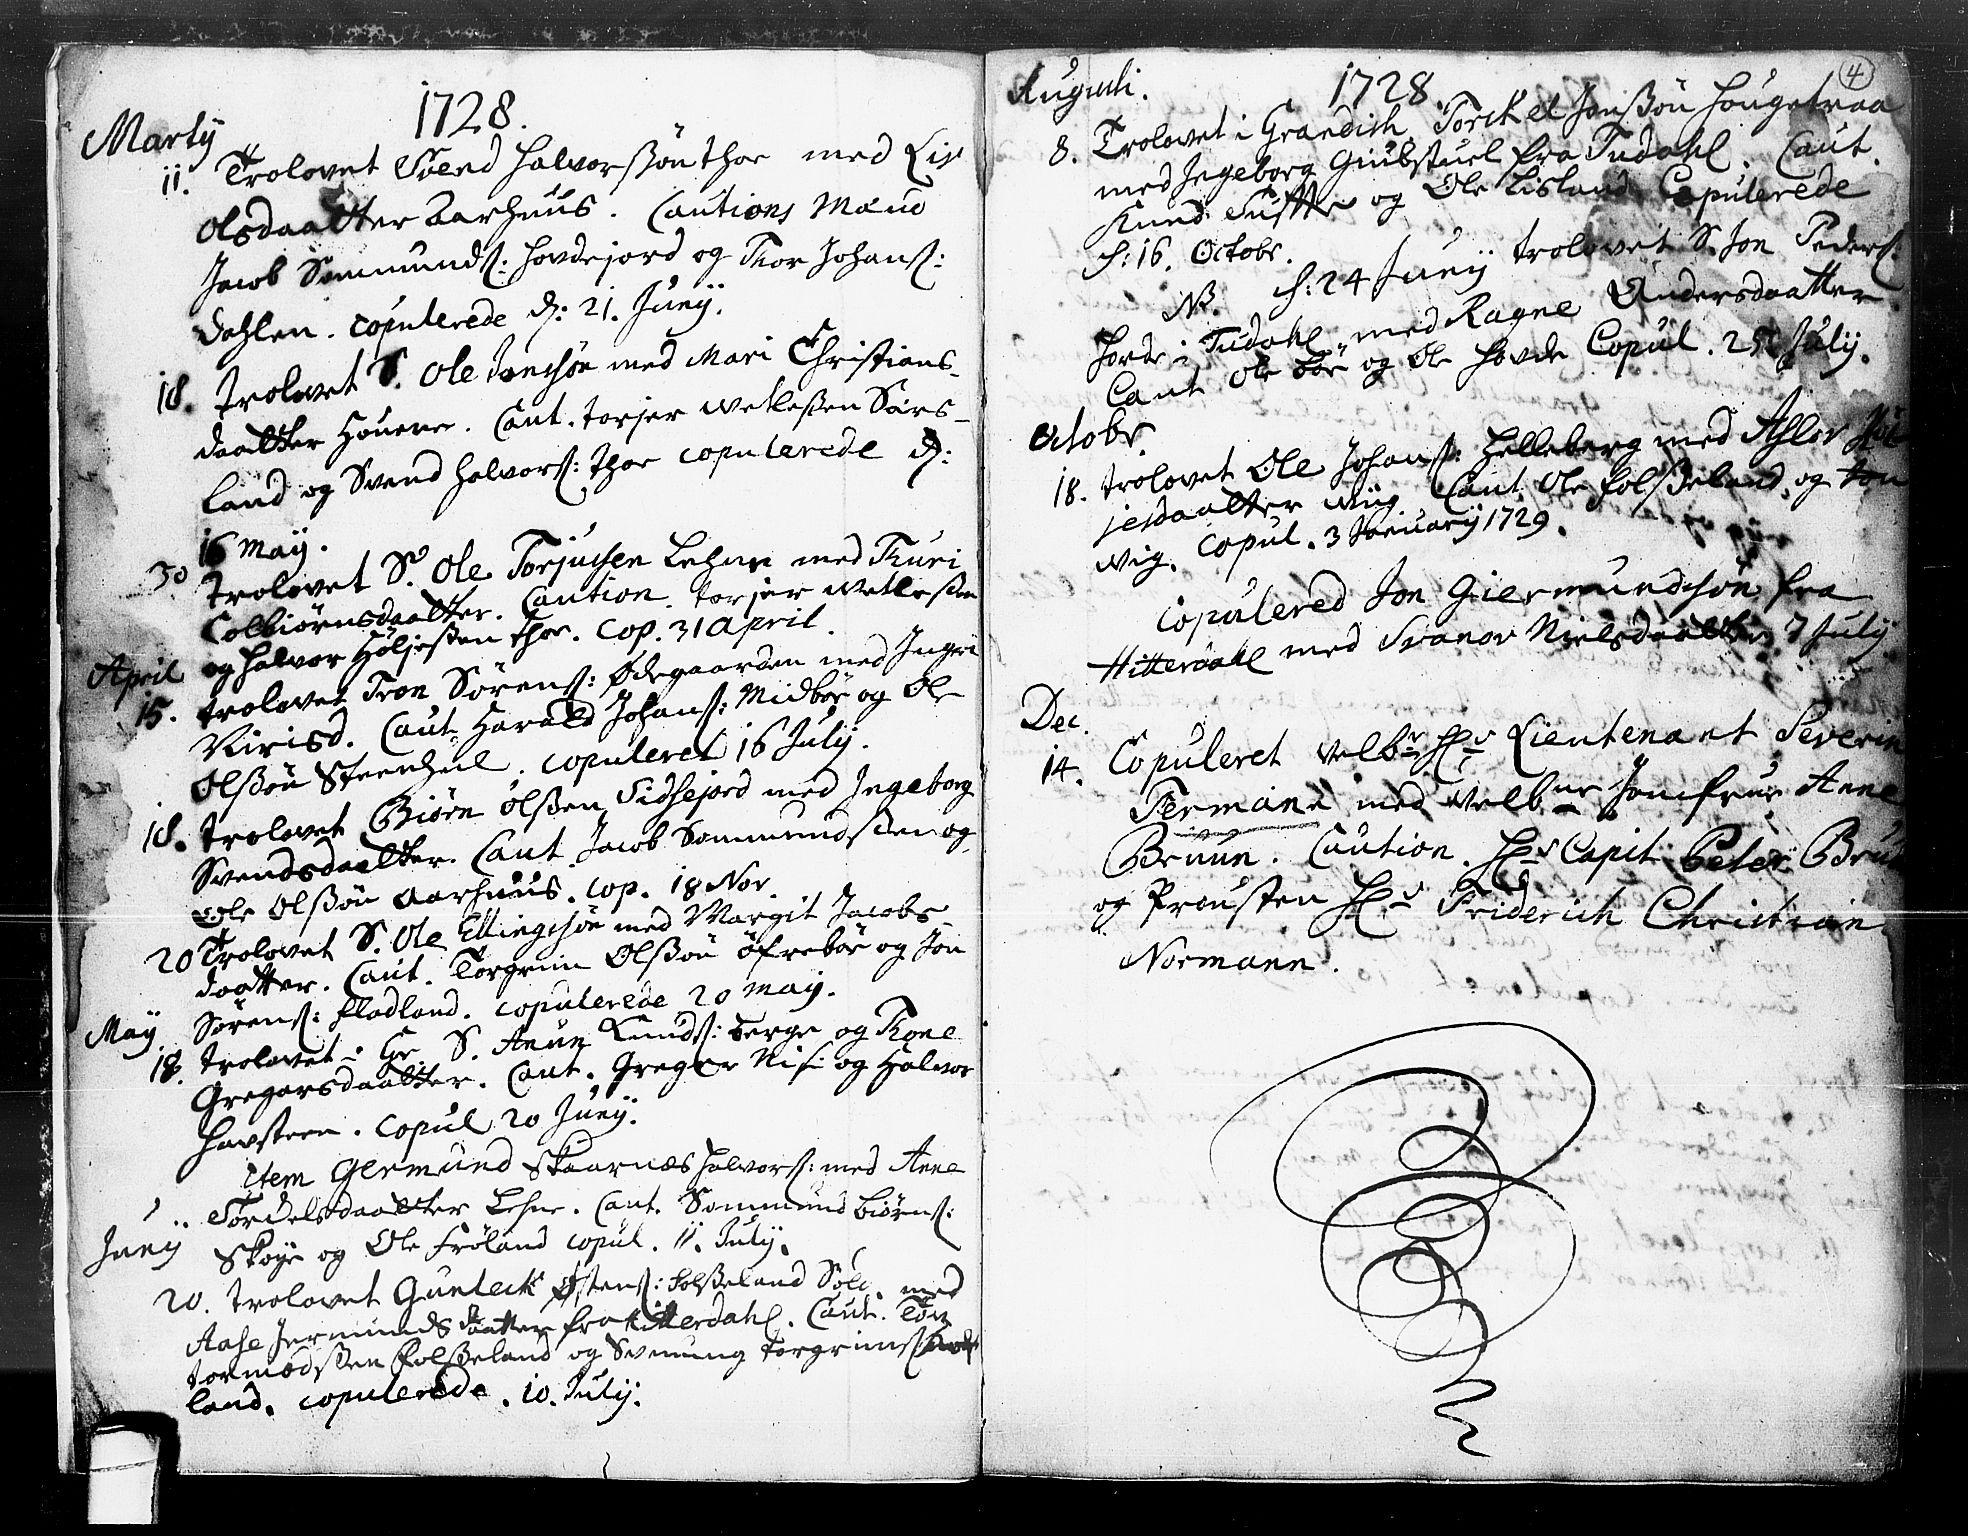 SAKO, Hjartdal kirkebøker, F/Fa/L0004: Ministerialbok nr. I 4, 1727-1795, s. 4